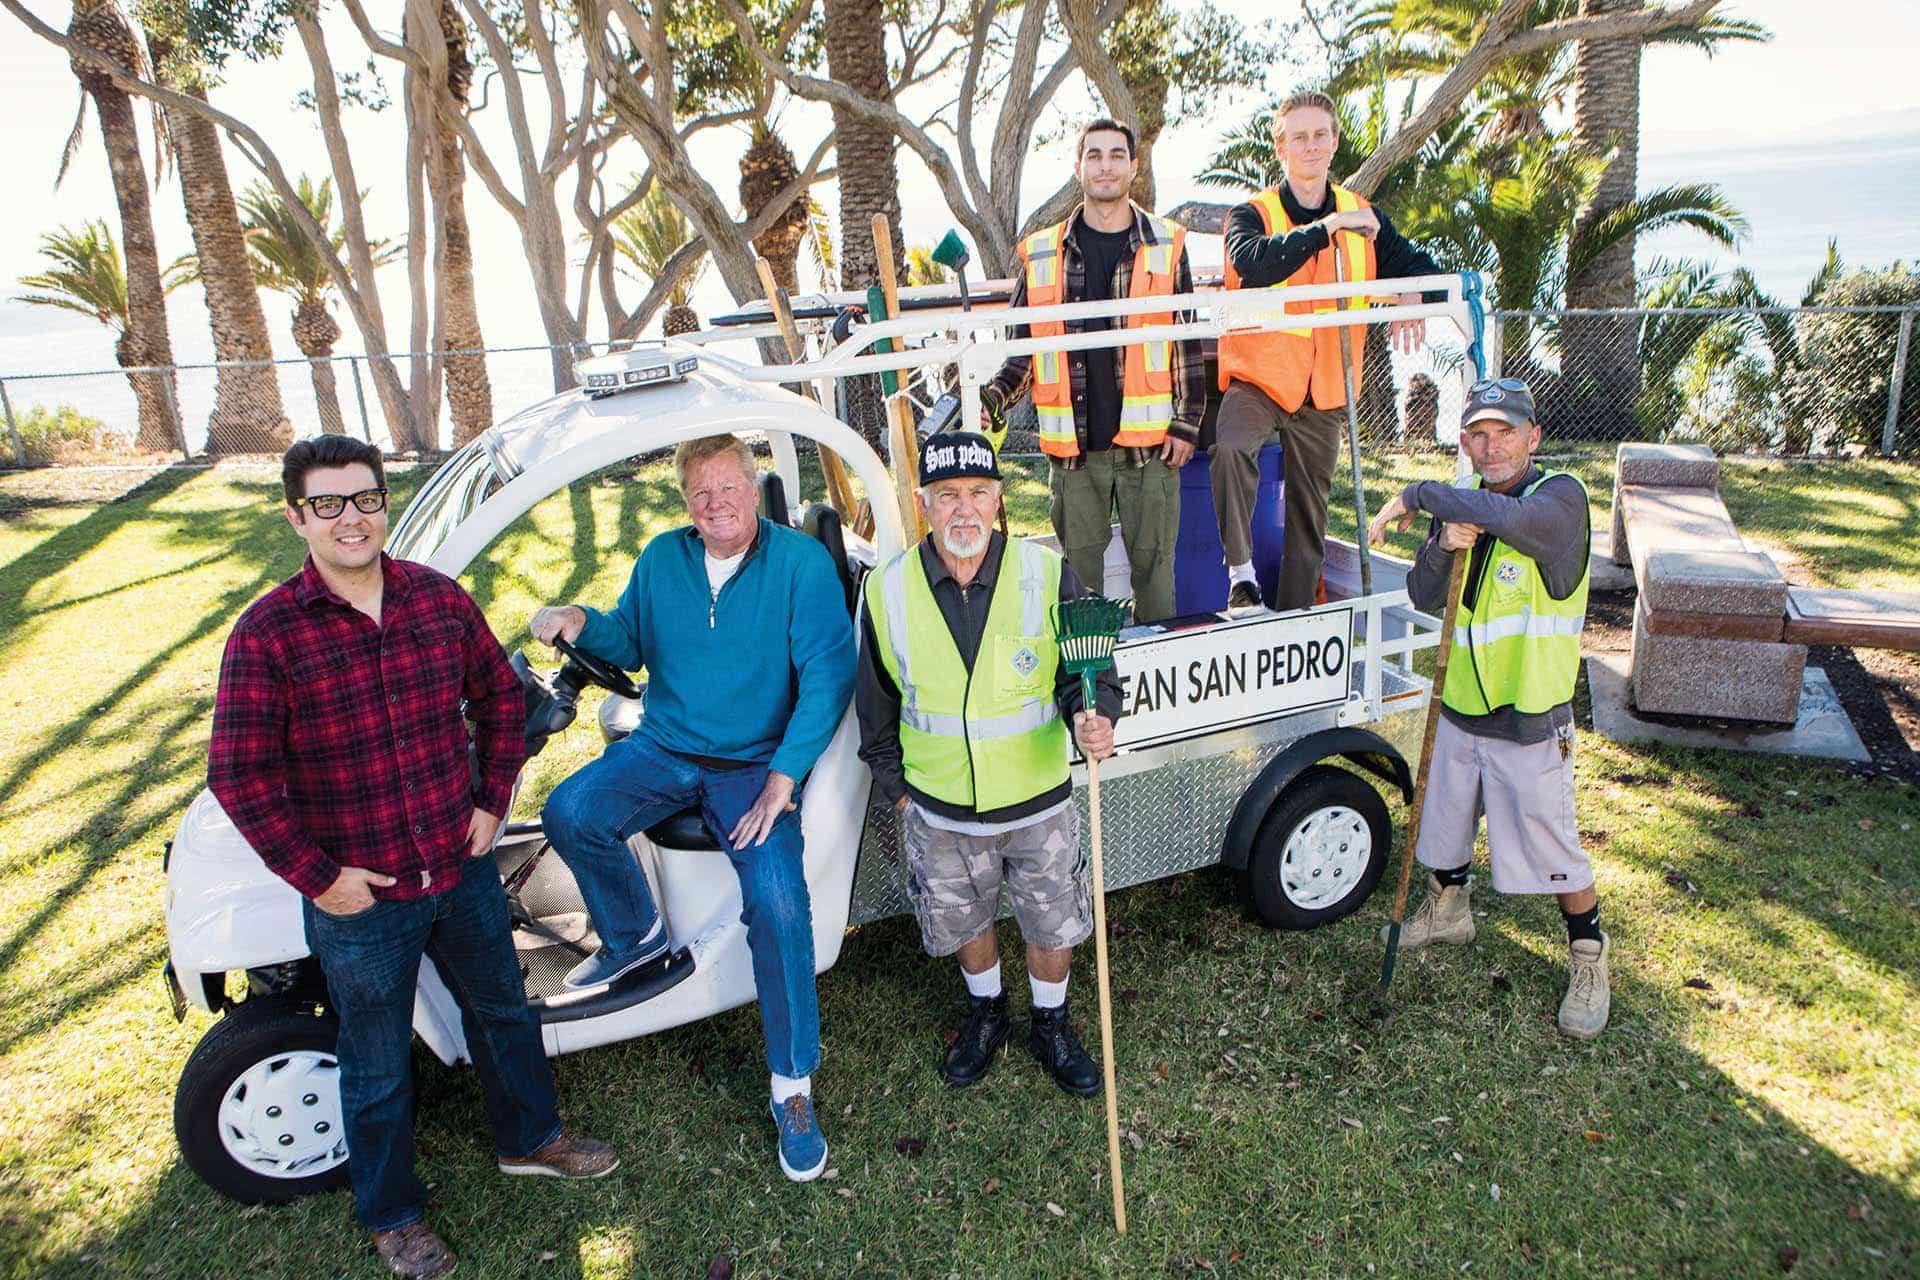 Photo of Clean San Pedro crew (l to r) Casey Warren, Steve Kleinjan, Mike Ornelas, Robby Lorenzi, Cameron White and Steve Adams. (photo: John Mattera Photography)